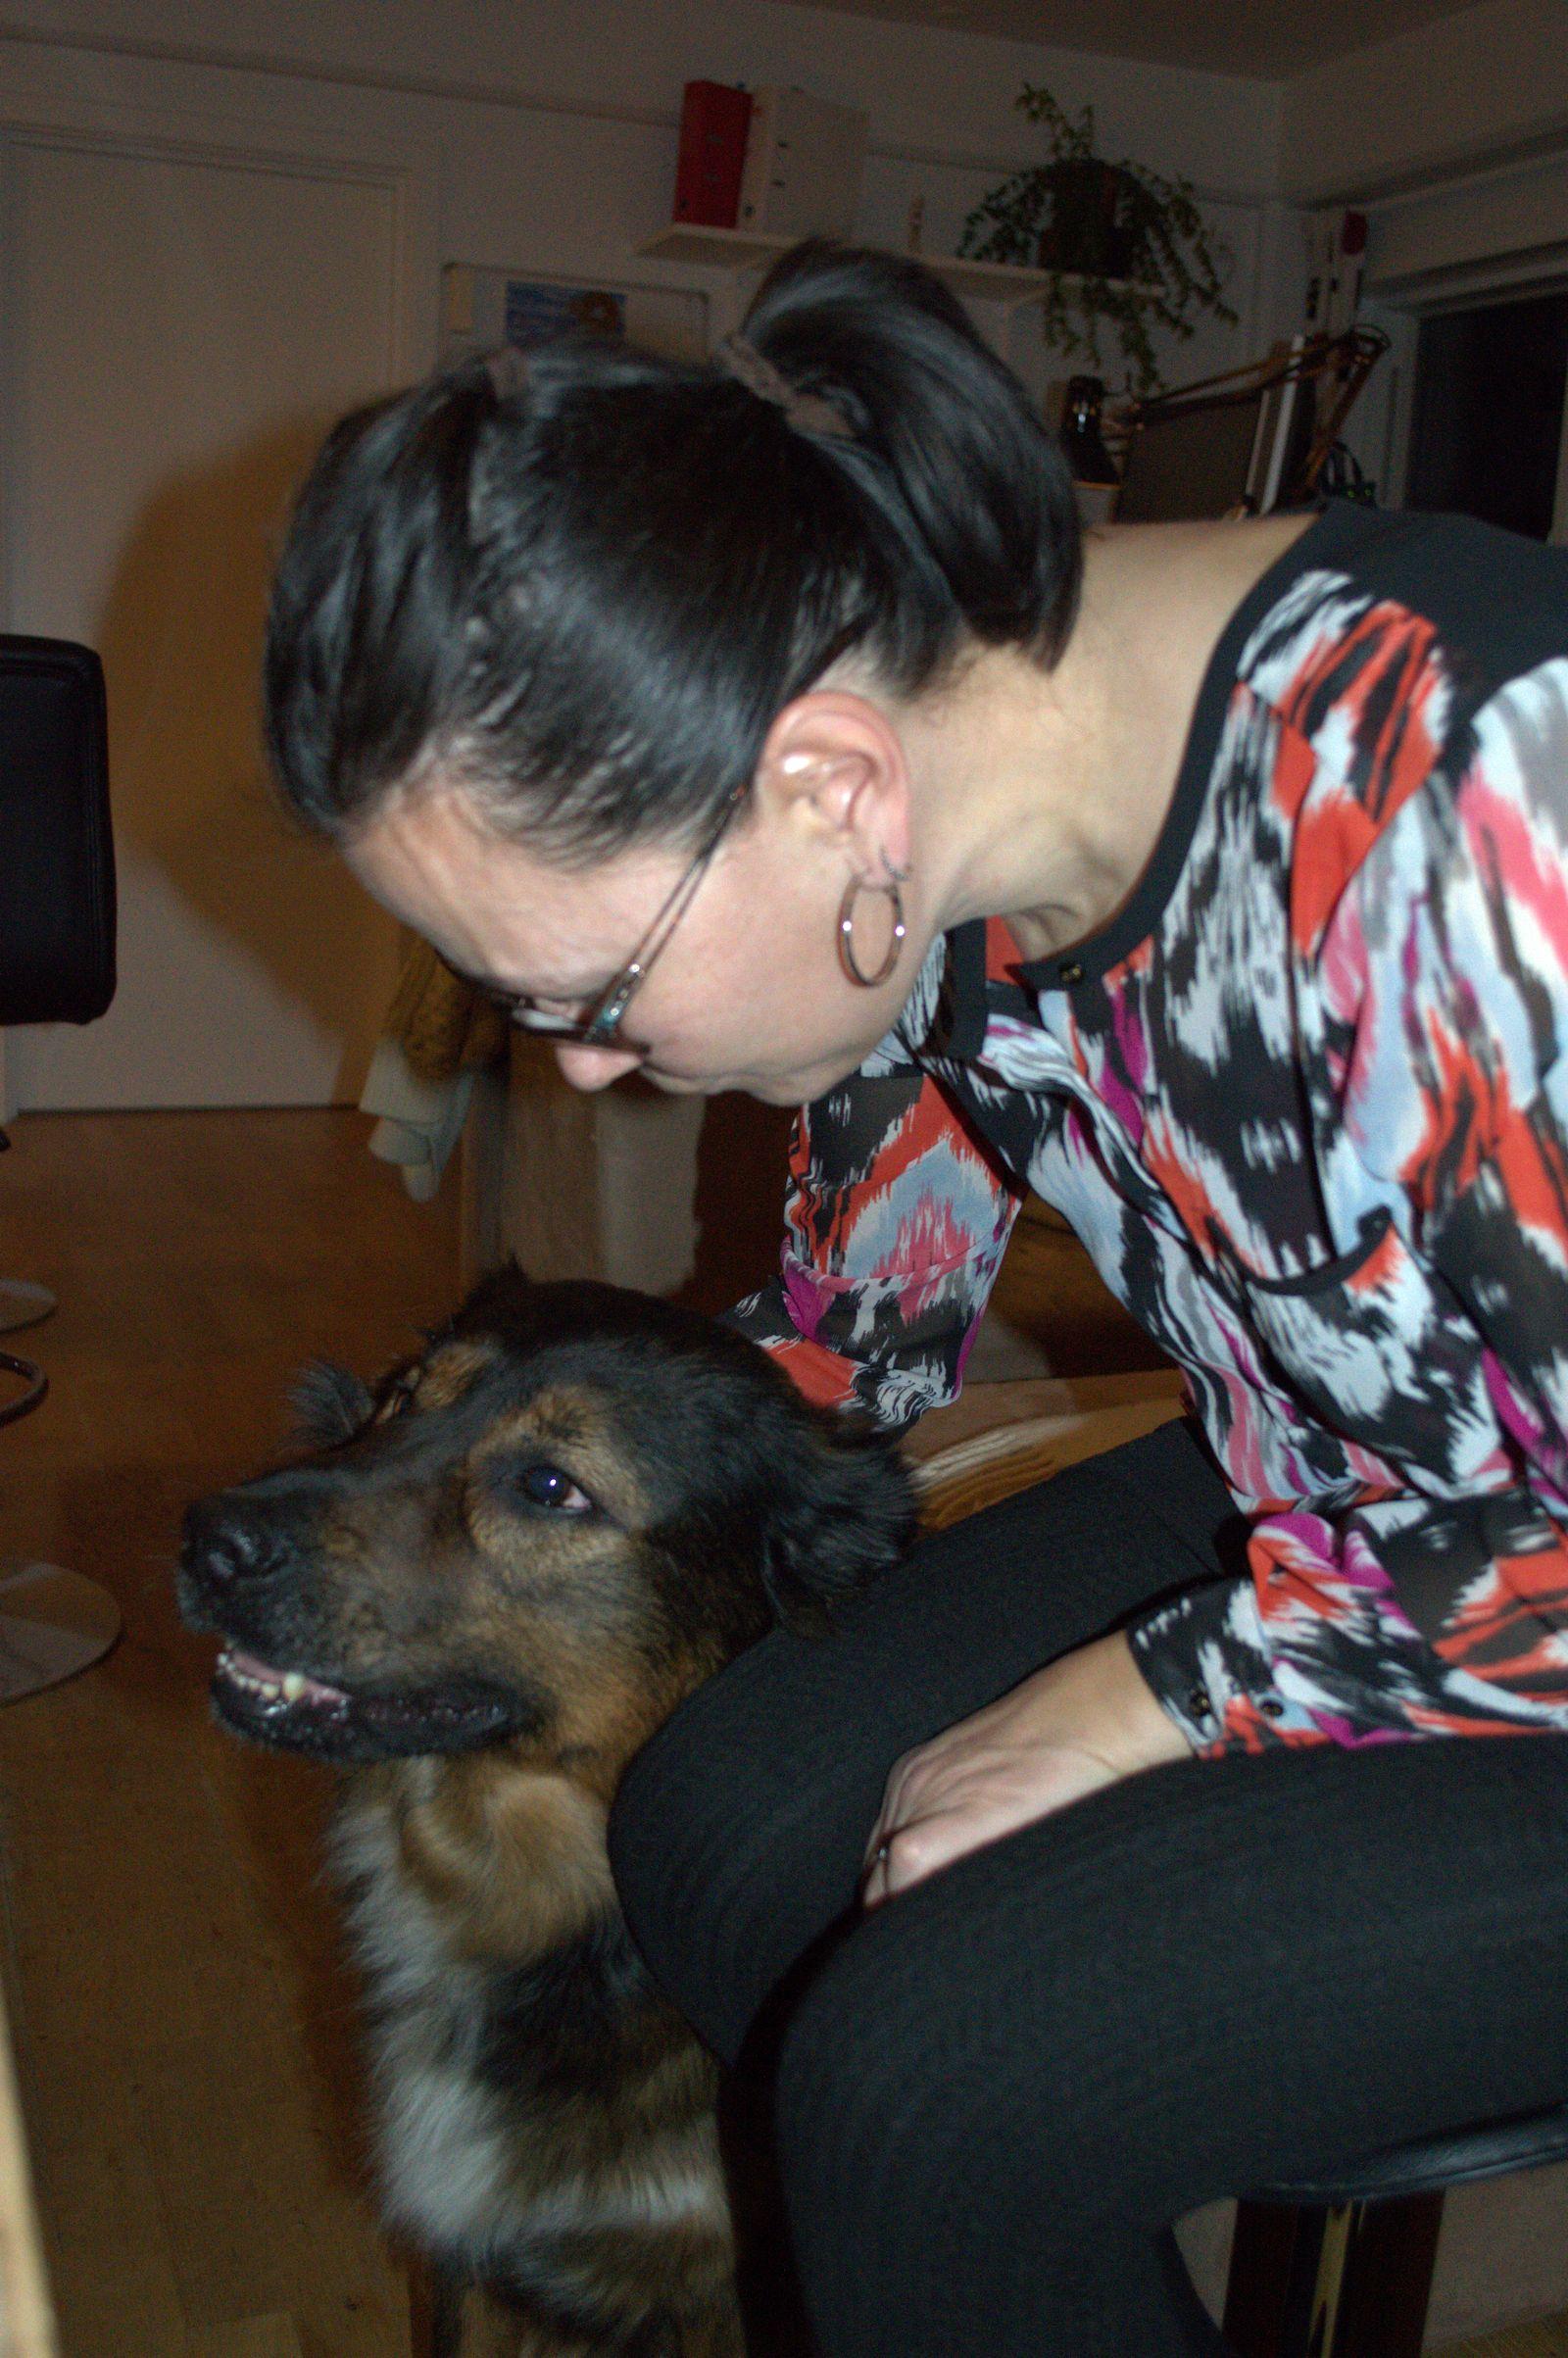 2014-04-05-2153_-_Djanco_Gode_1_Nuka-Klausen-Telling